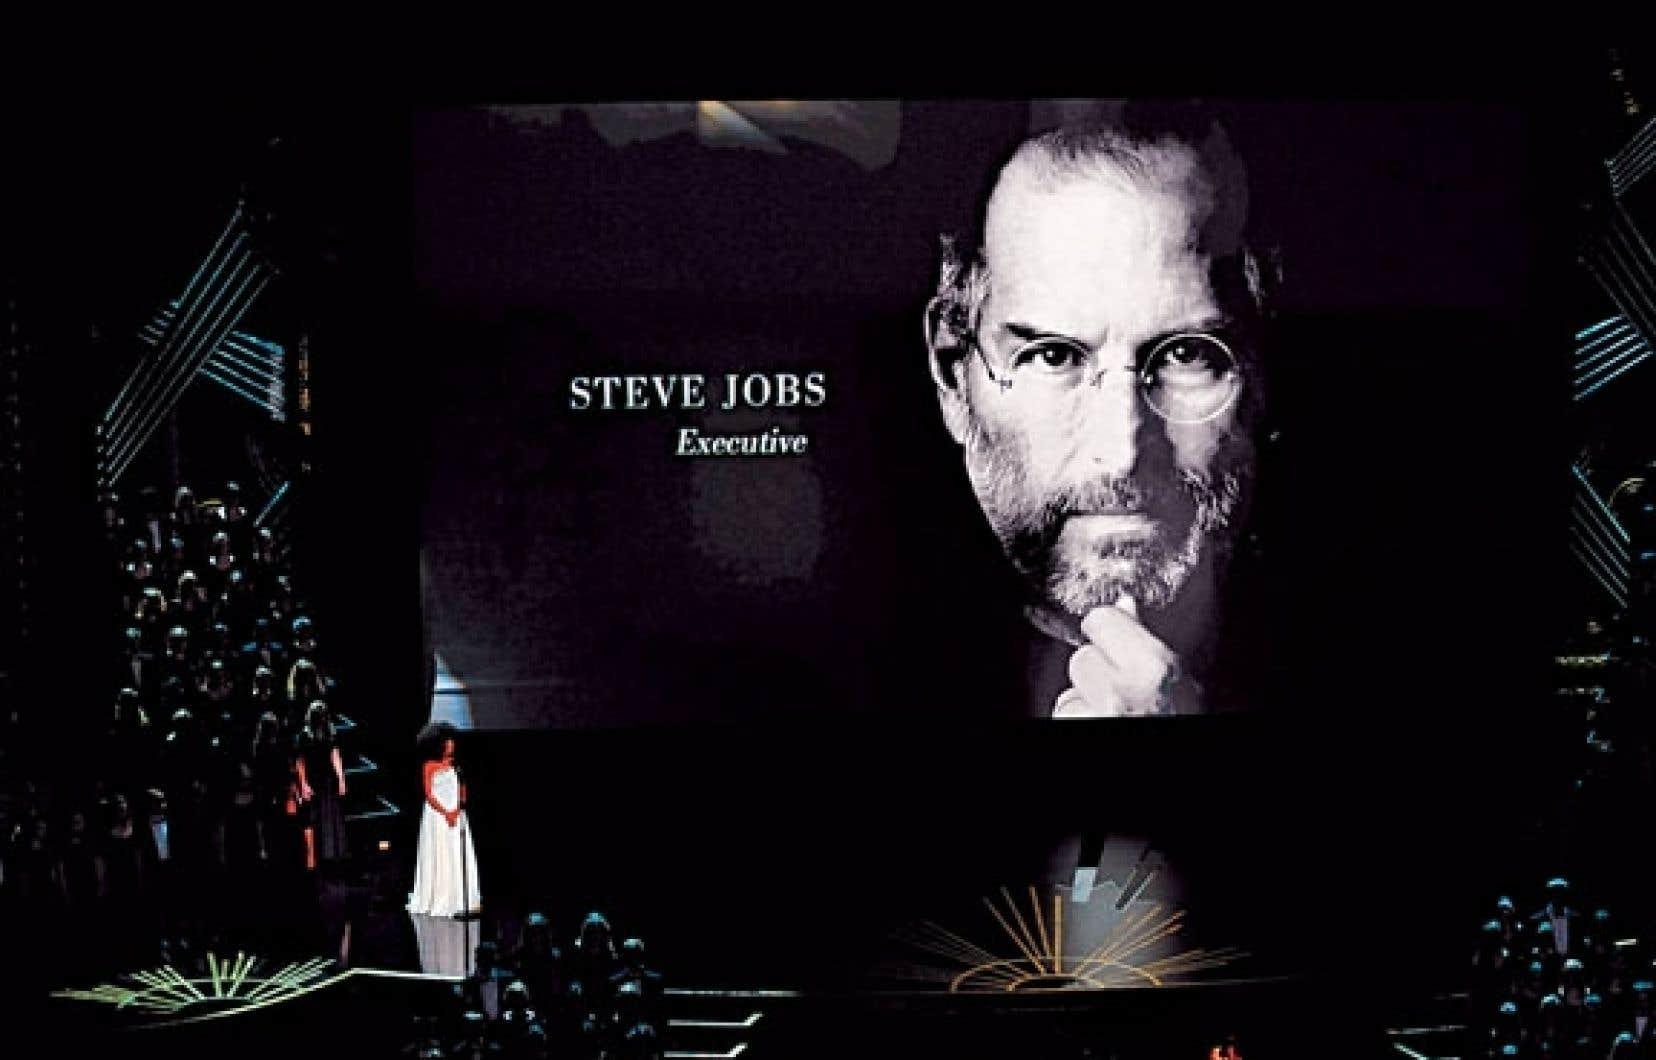 Trois geeks devenus célèbres : Steve Jobs (Apple), Bill Gates (Microsoft) et Mark Zuckerberg (Facebook).